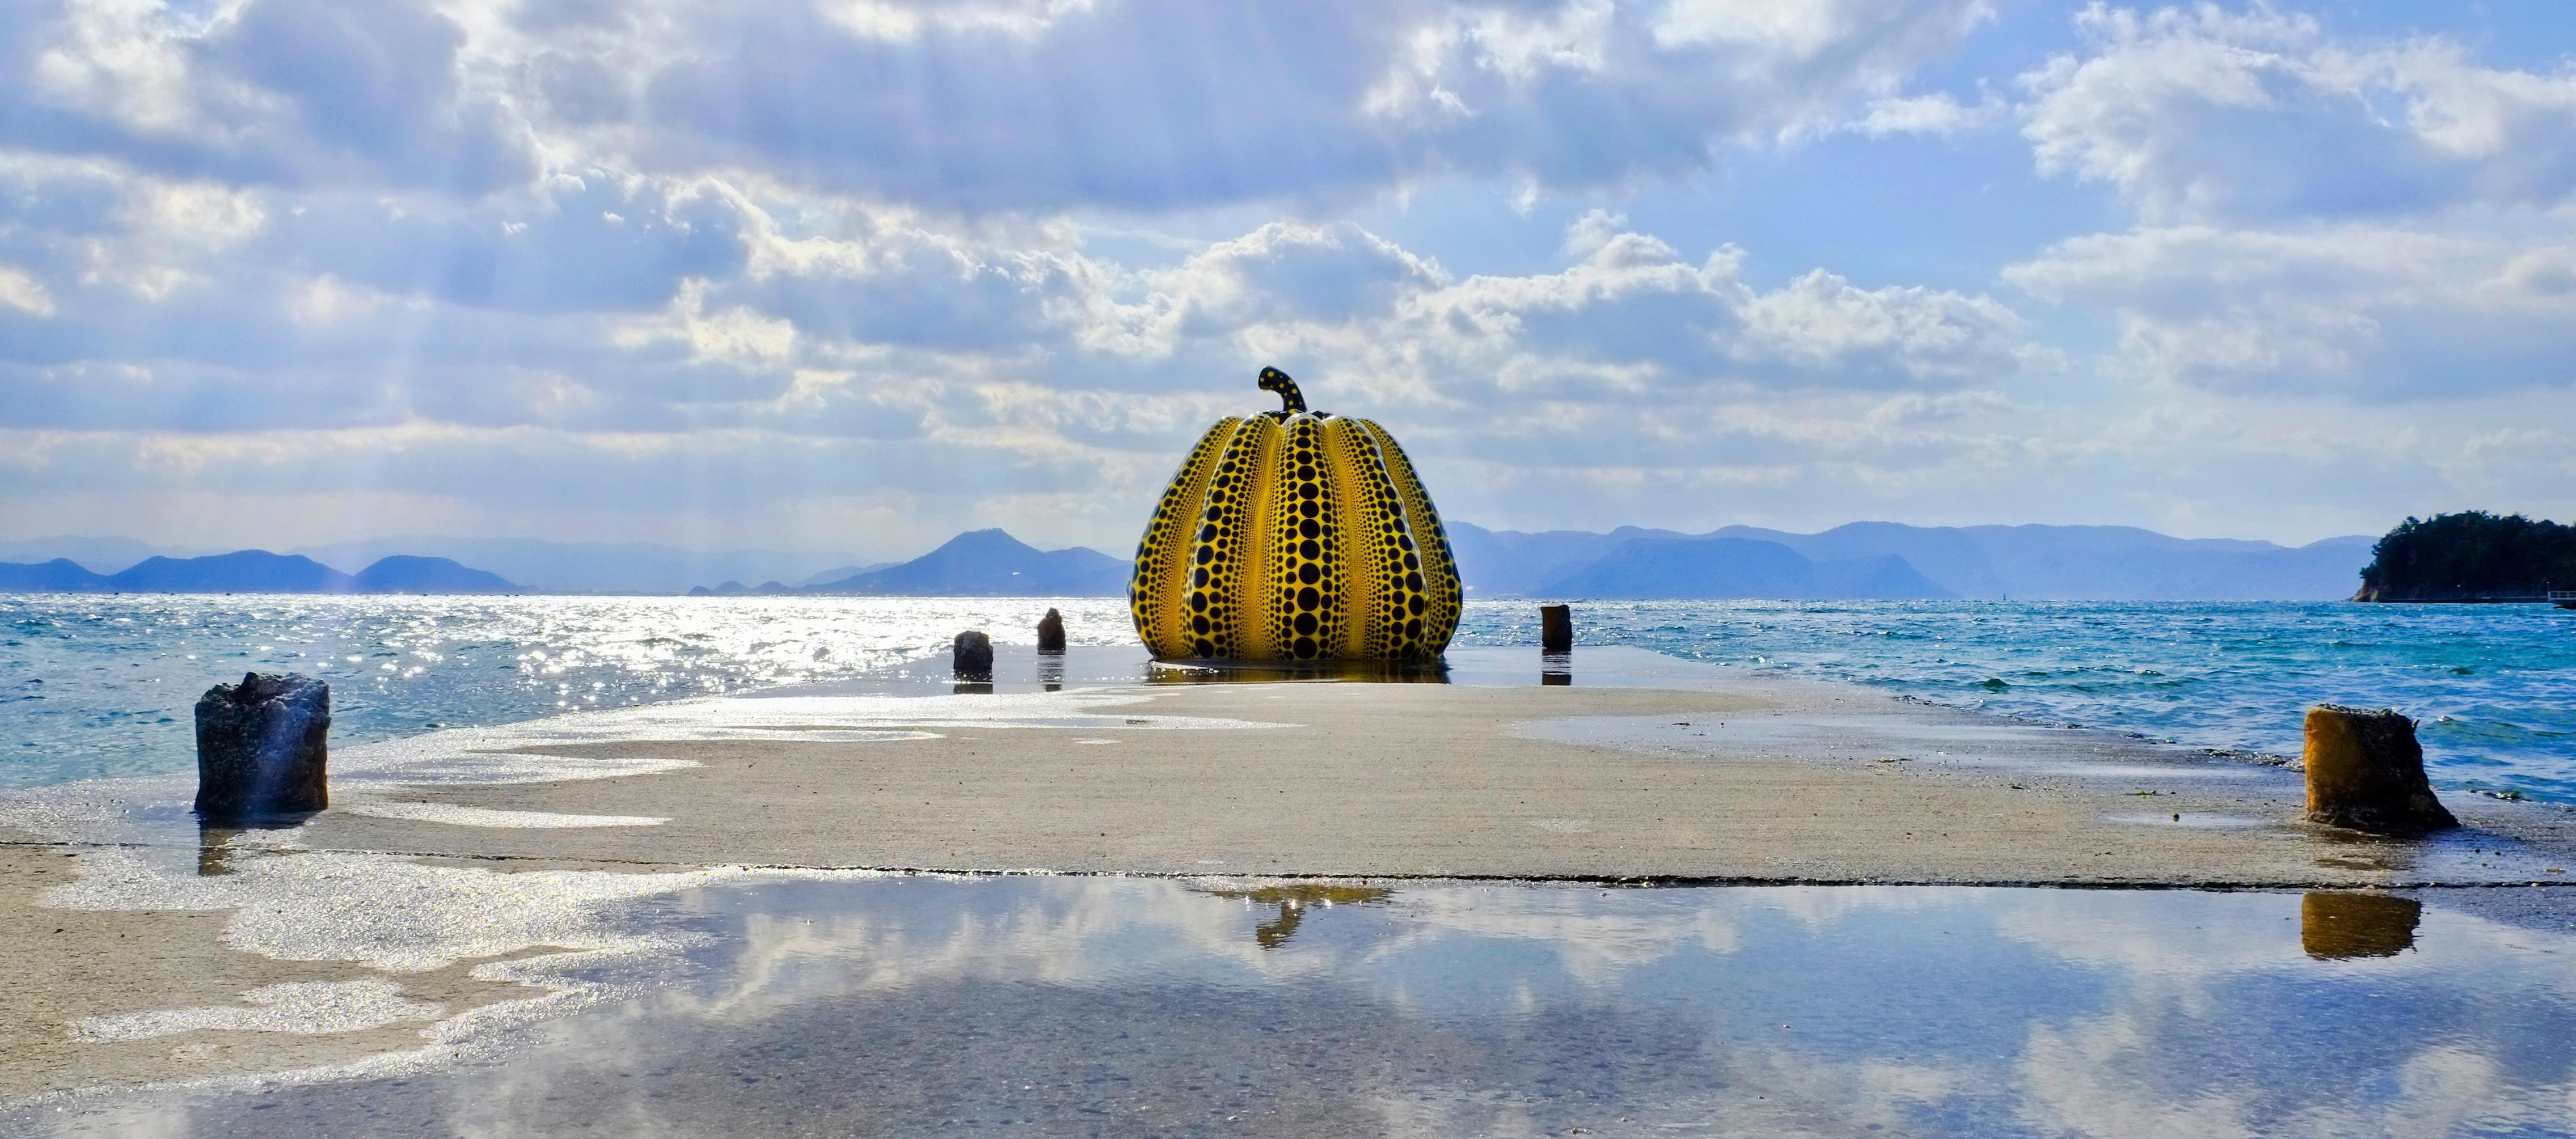 Japan's arty-pelago: Naoshima and beyond